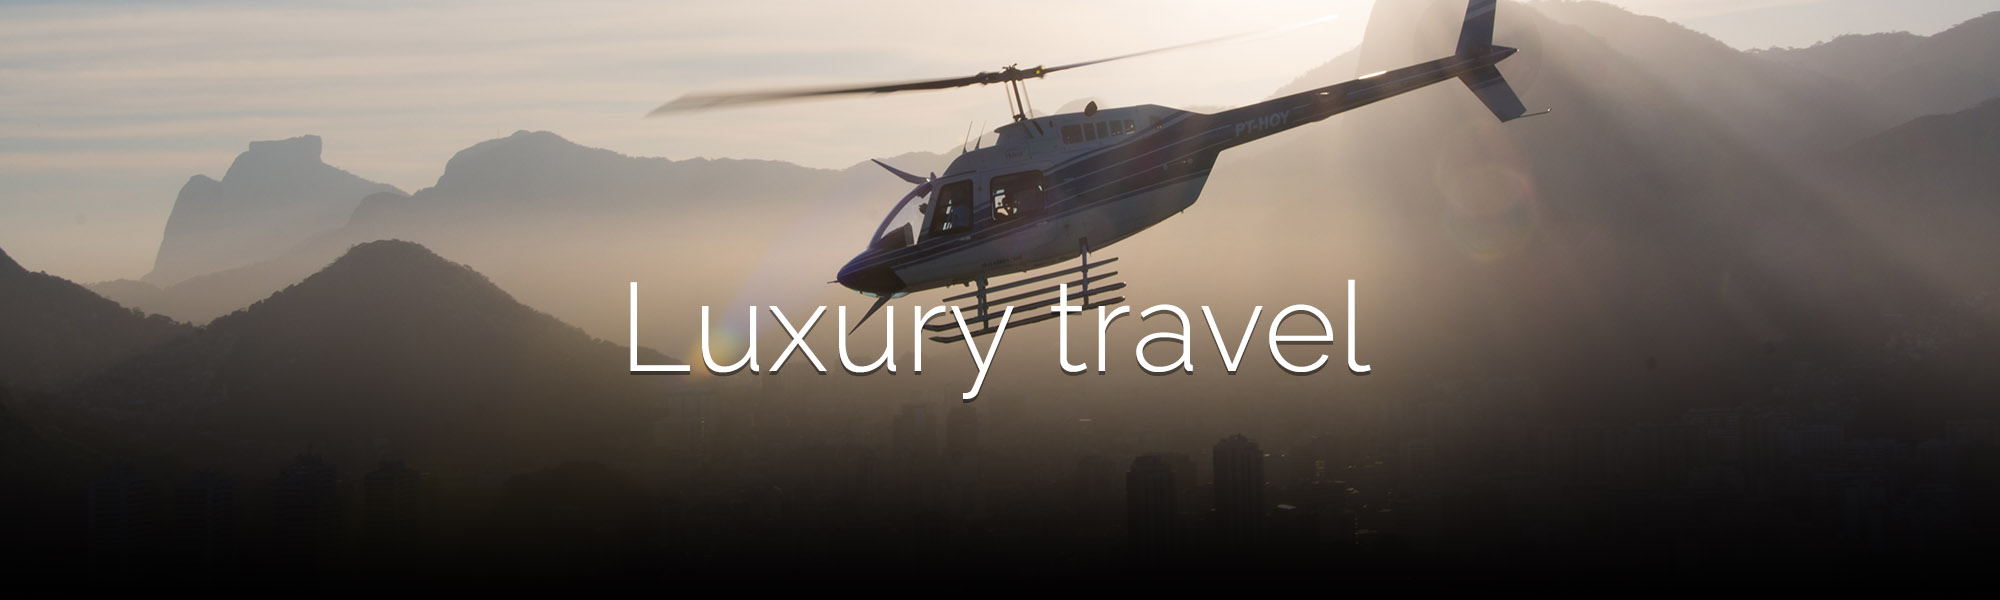 luxury travel stats